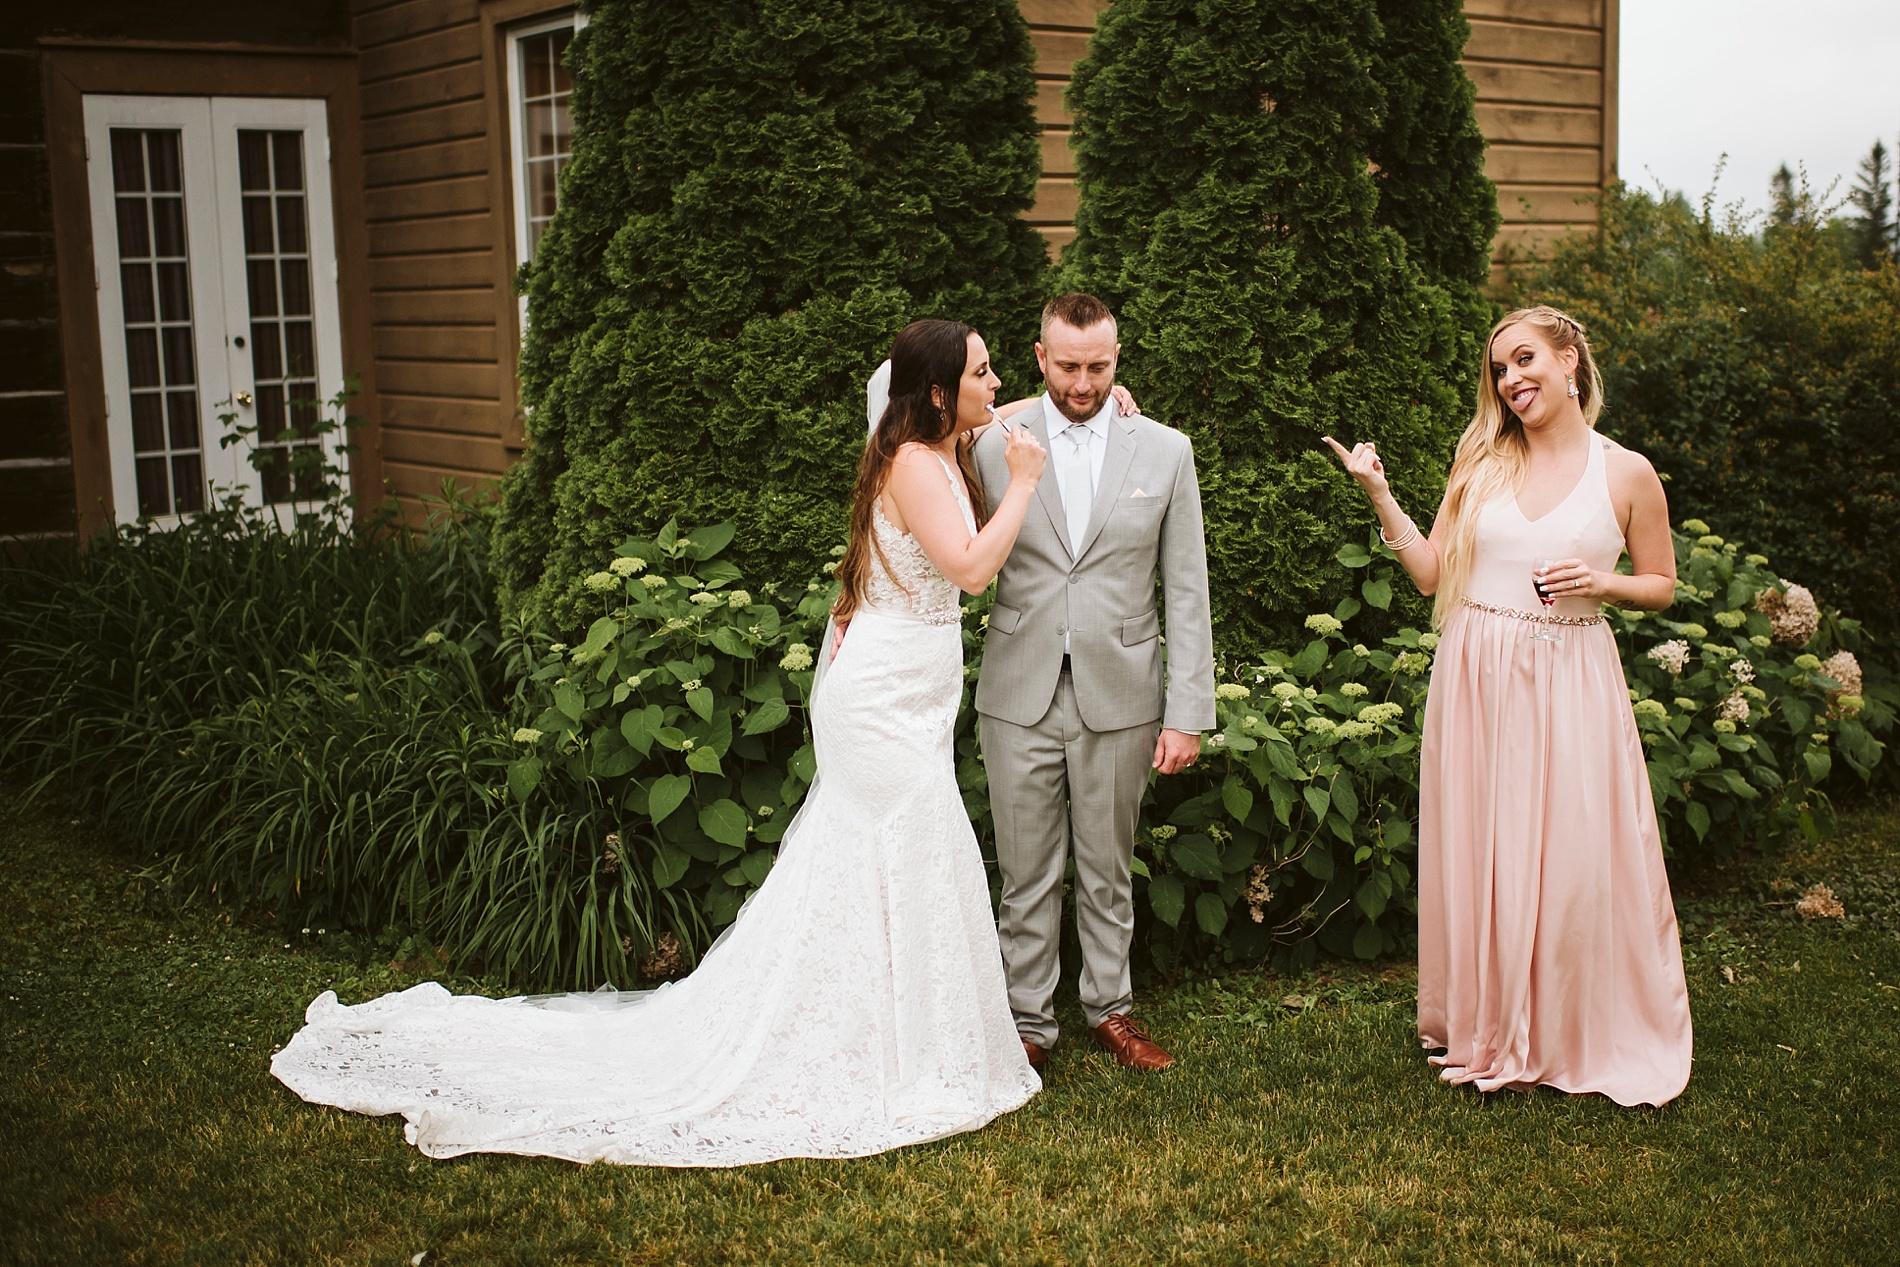 Kawartha_Lakes_Wedding_Bobcageon_Eganridge_Resort_Toronto_Photographer_0055.jpg